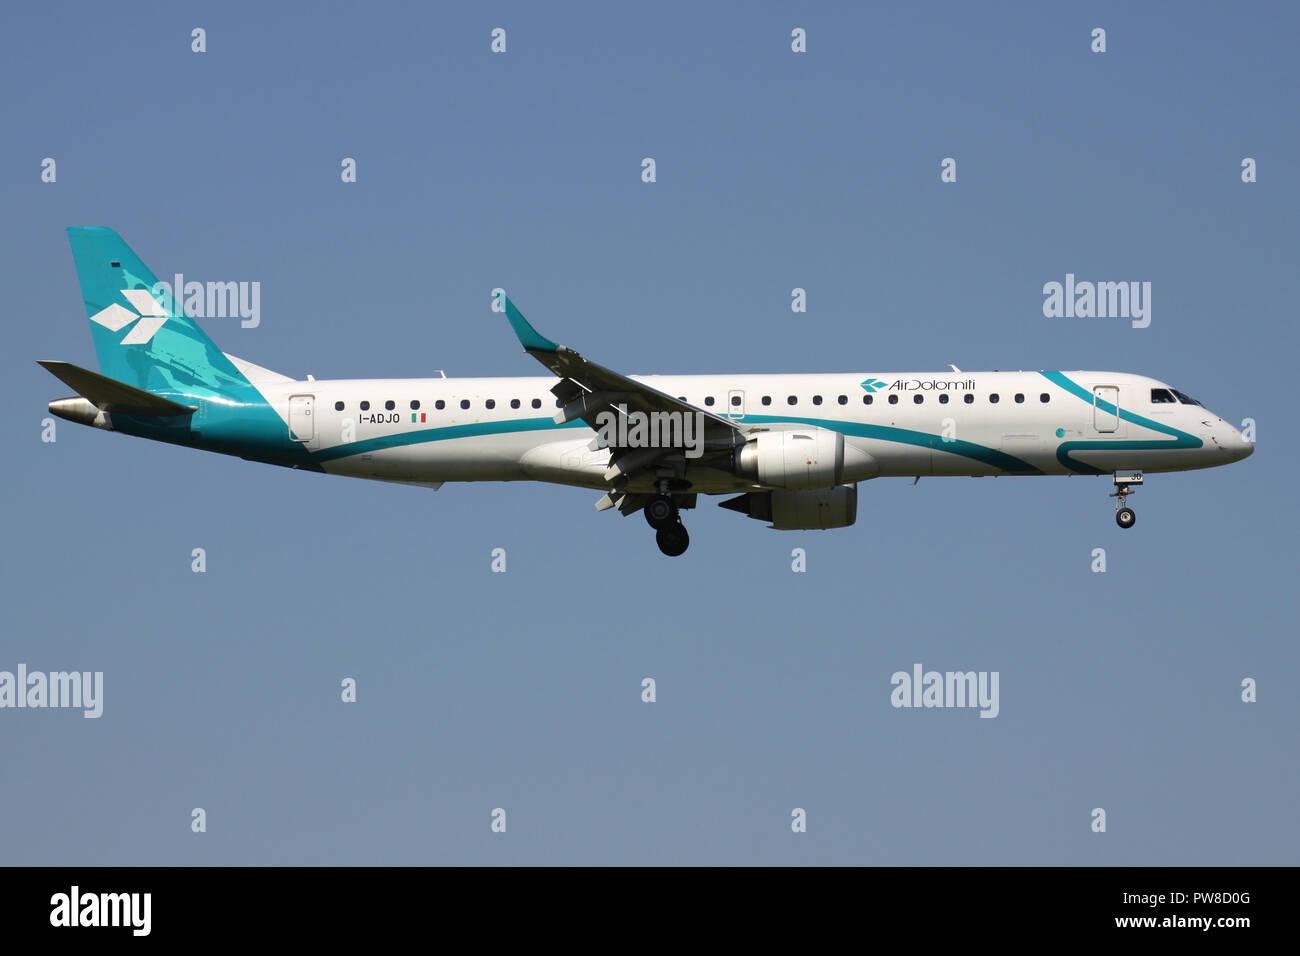 Italian Air Dolomiti ERJ-195 with registration I-ADJO on short final for runway 14 of Zurich Airport. - Stock Image